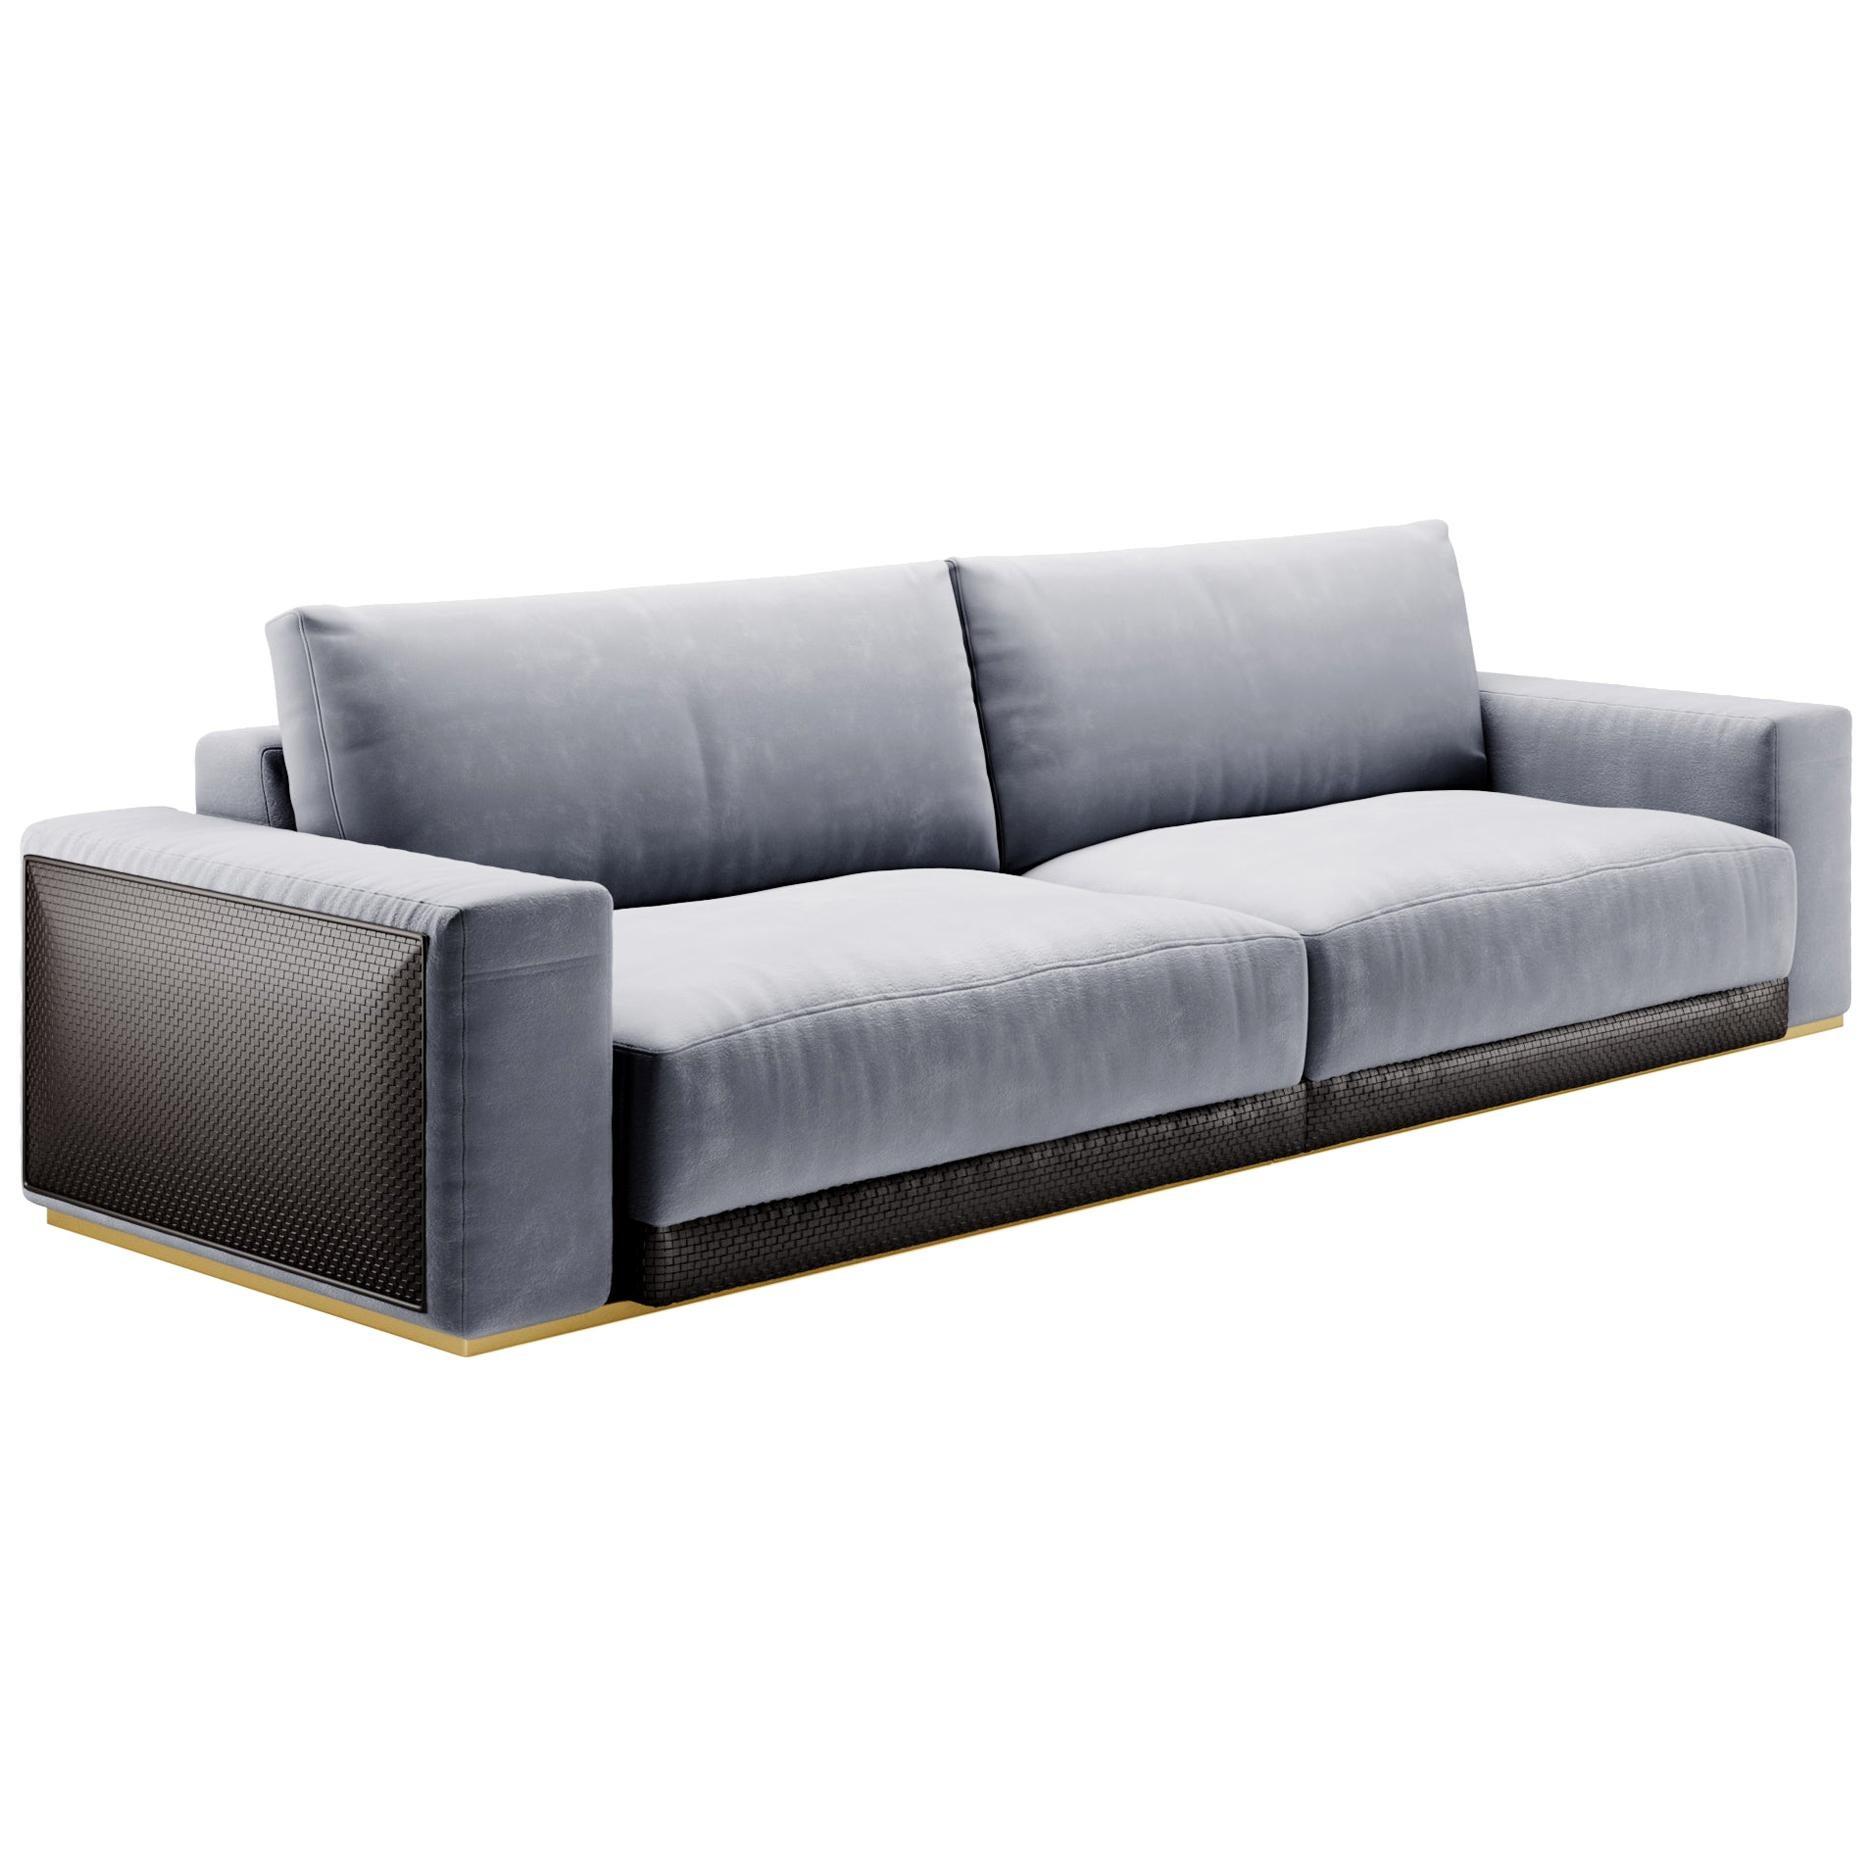 Modular Sofa, Contemporary Sofa by Fabio Arcaini Settee Velvet Leather